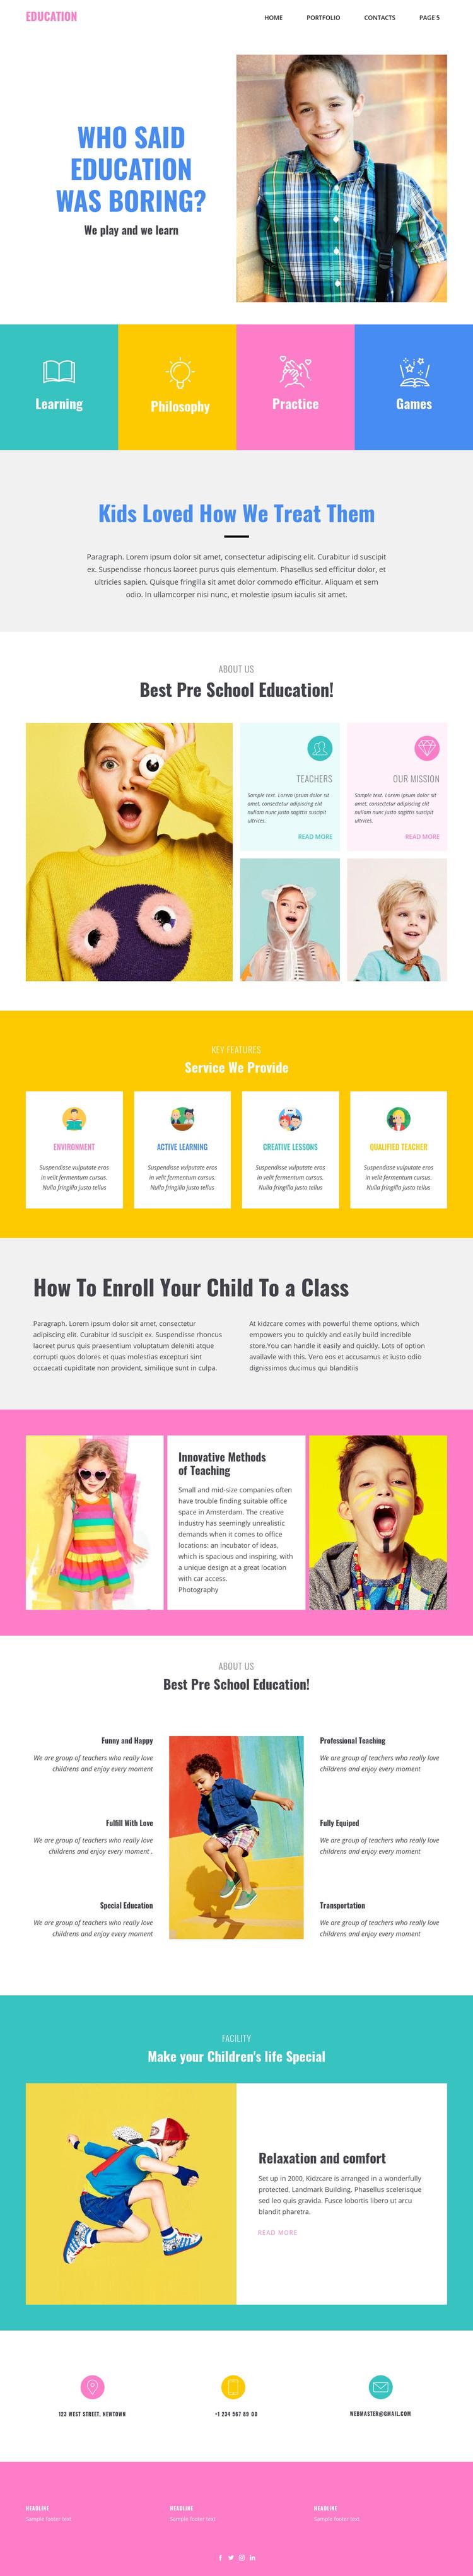 Fun of learning in school Homepage Design